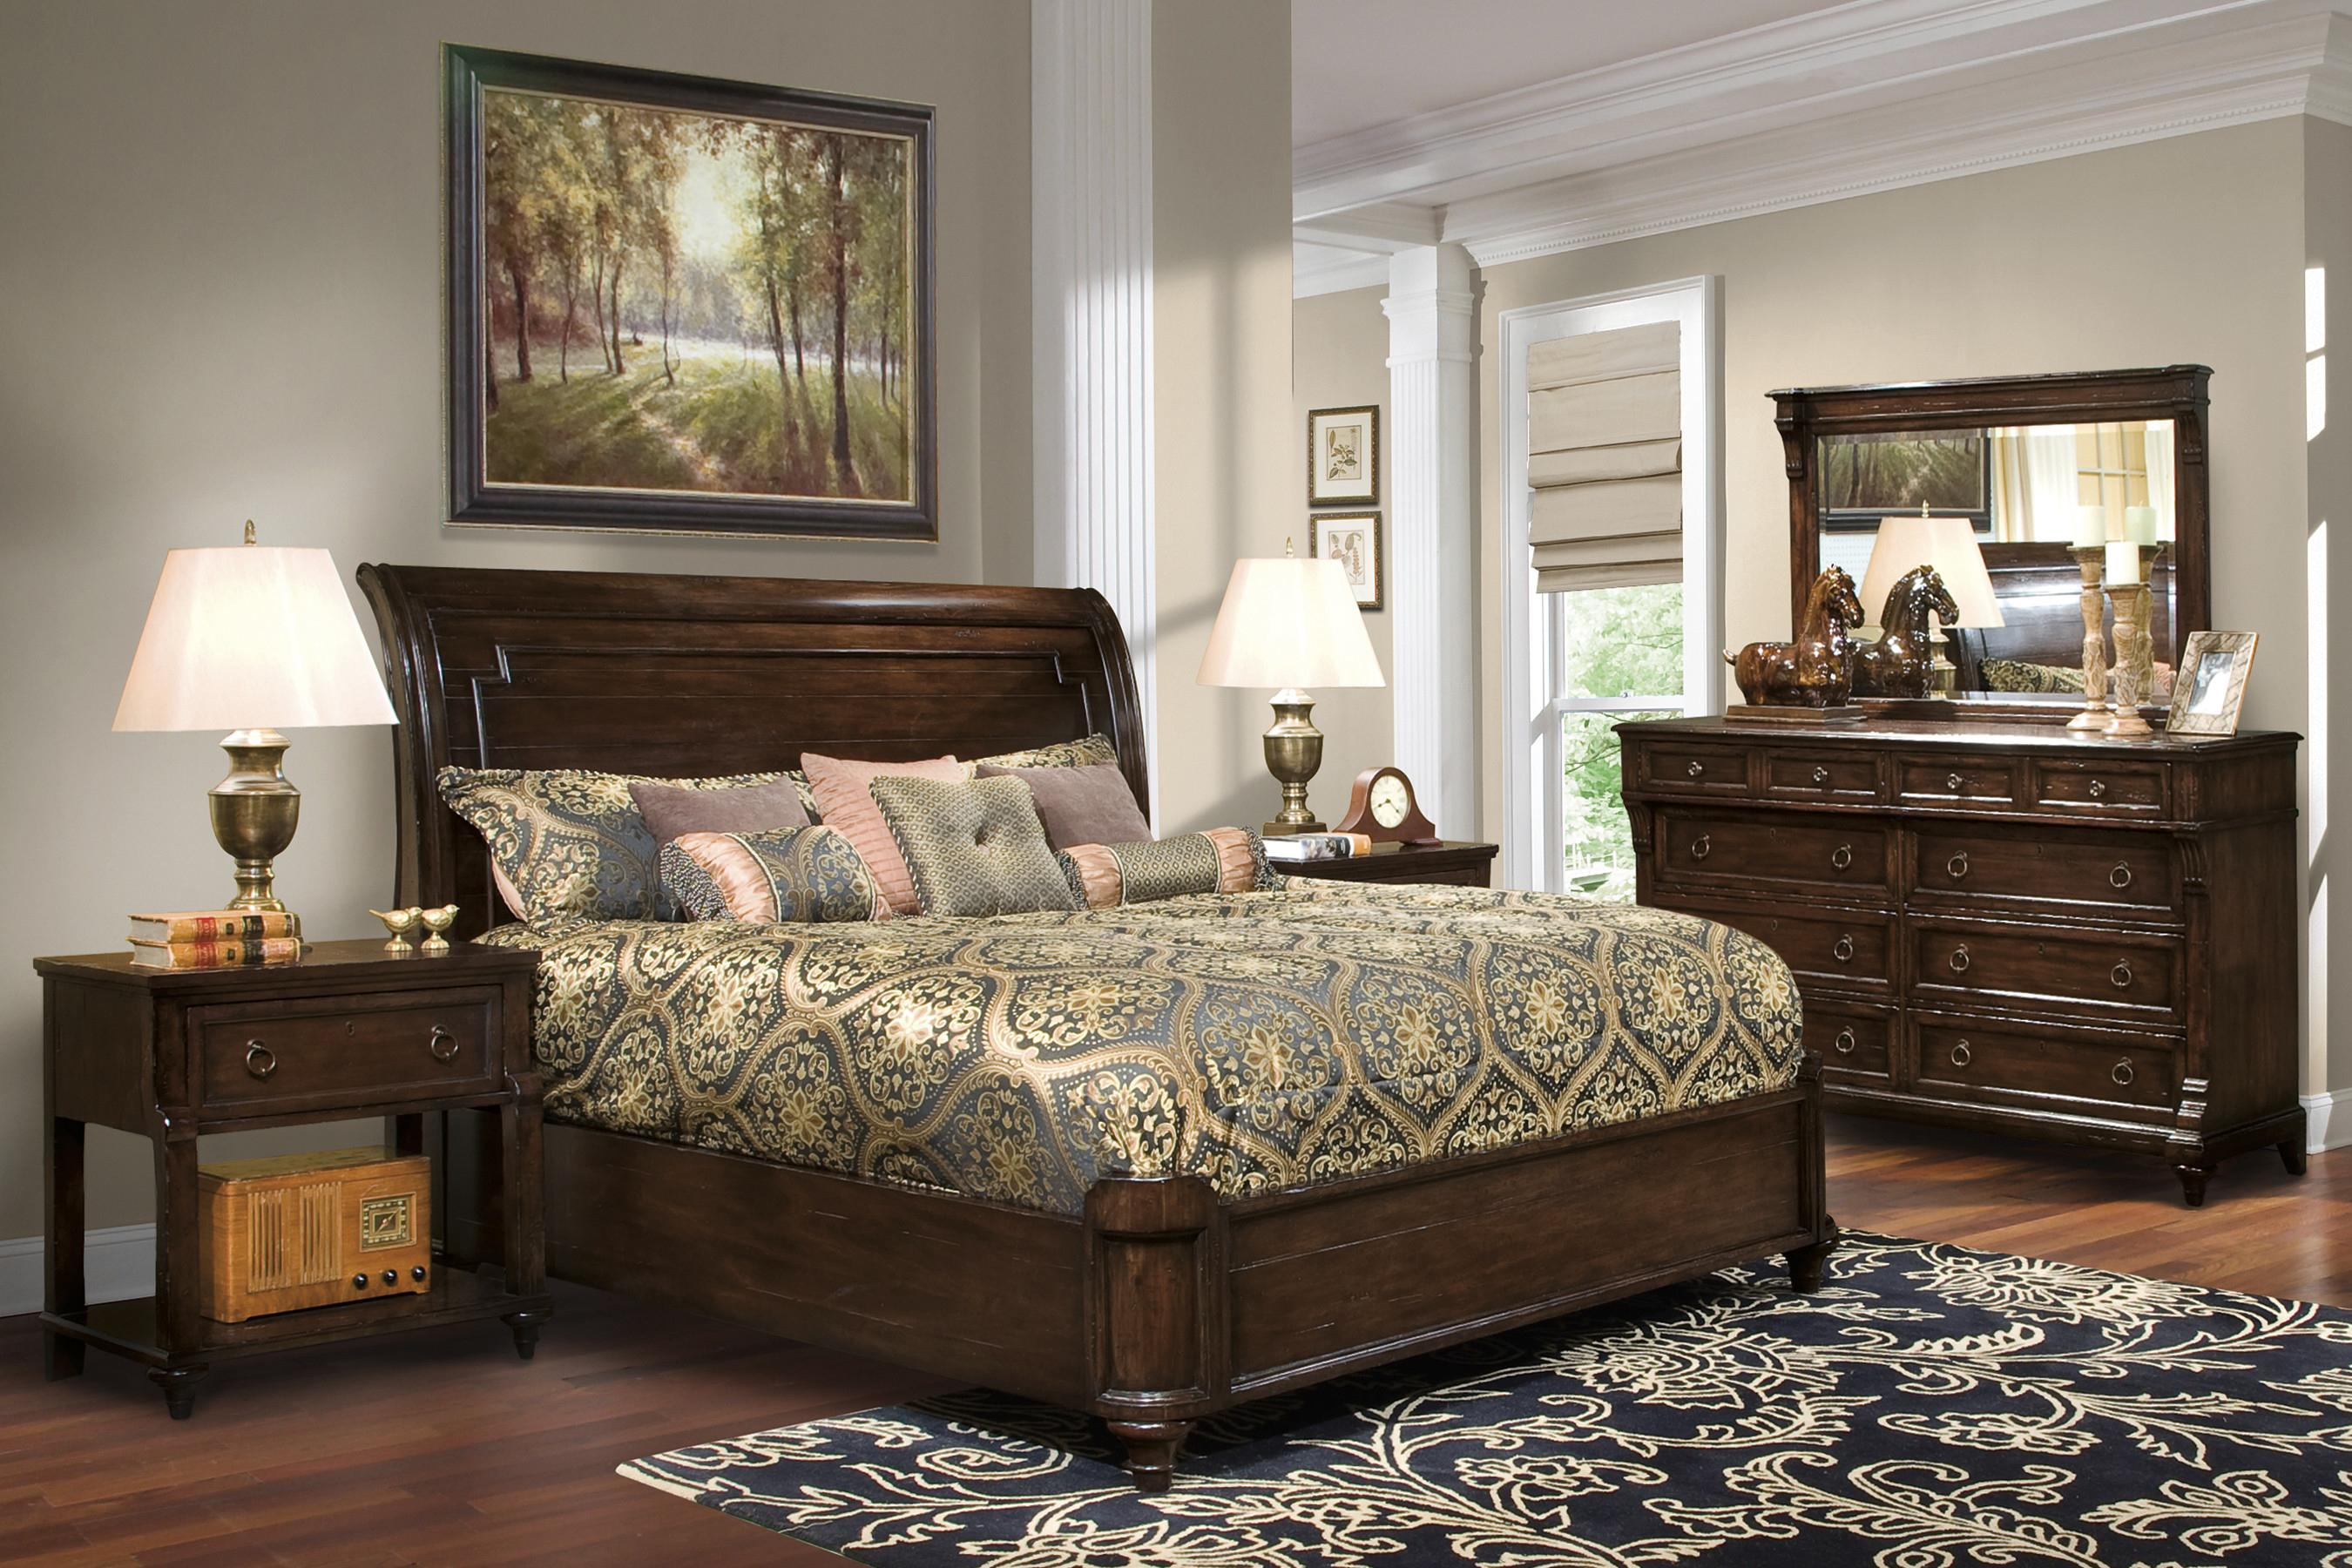 Hekman Charleston Place King Bedroom Group 2 Olinde 39 S Furniture Bedroom Group